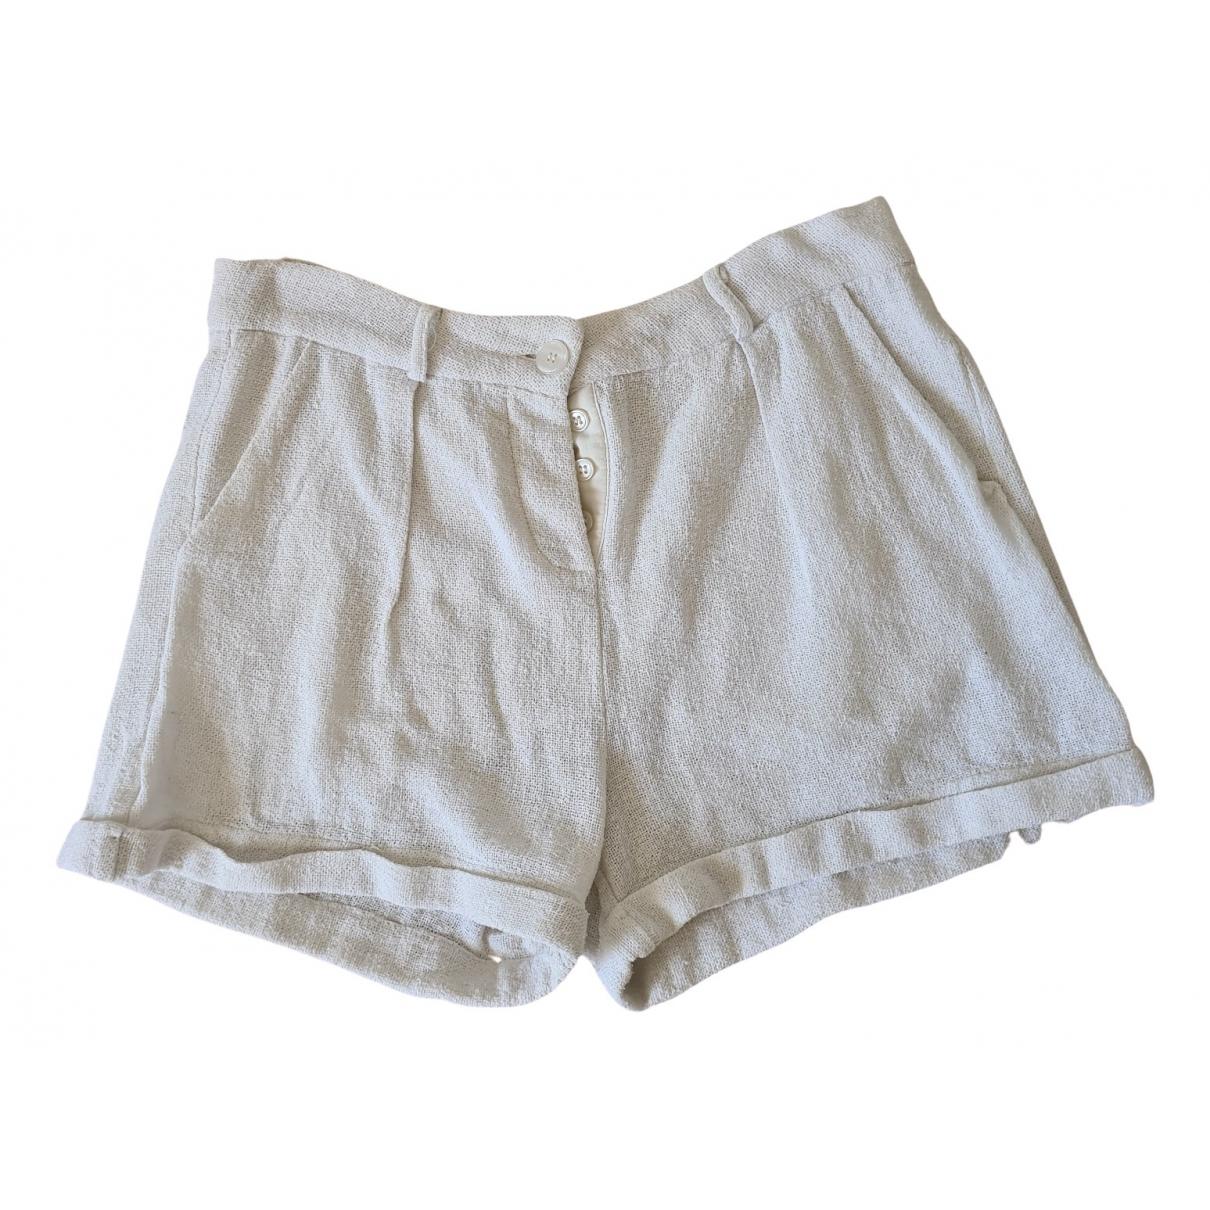 Maje Spring Summer 2019 Shorts in  Weiss Baumwolle